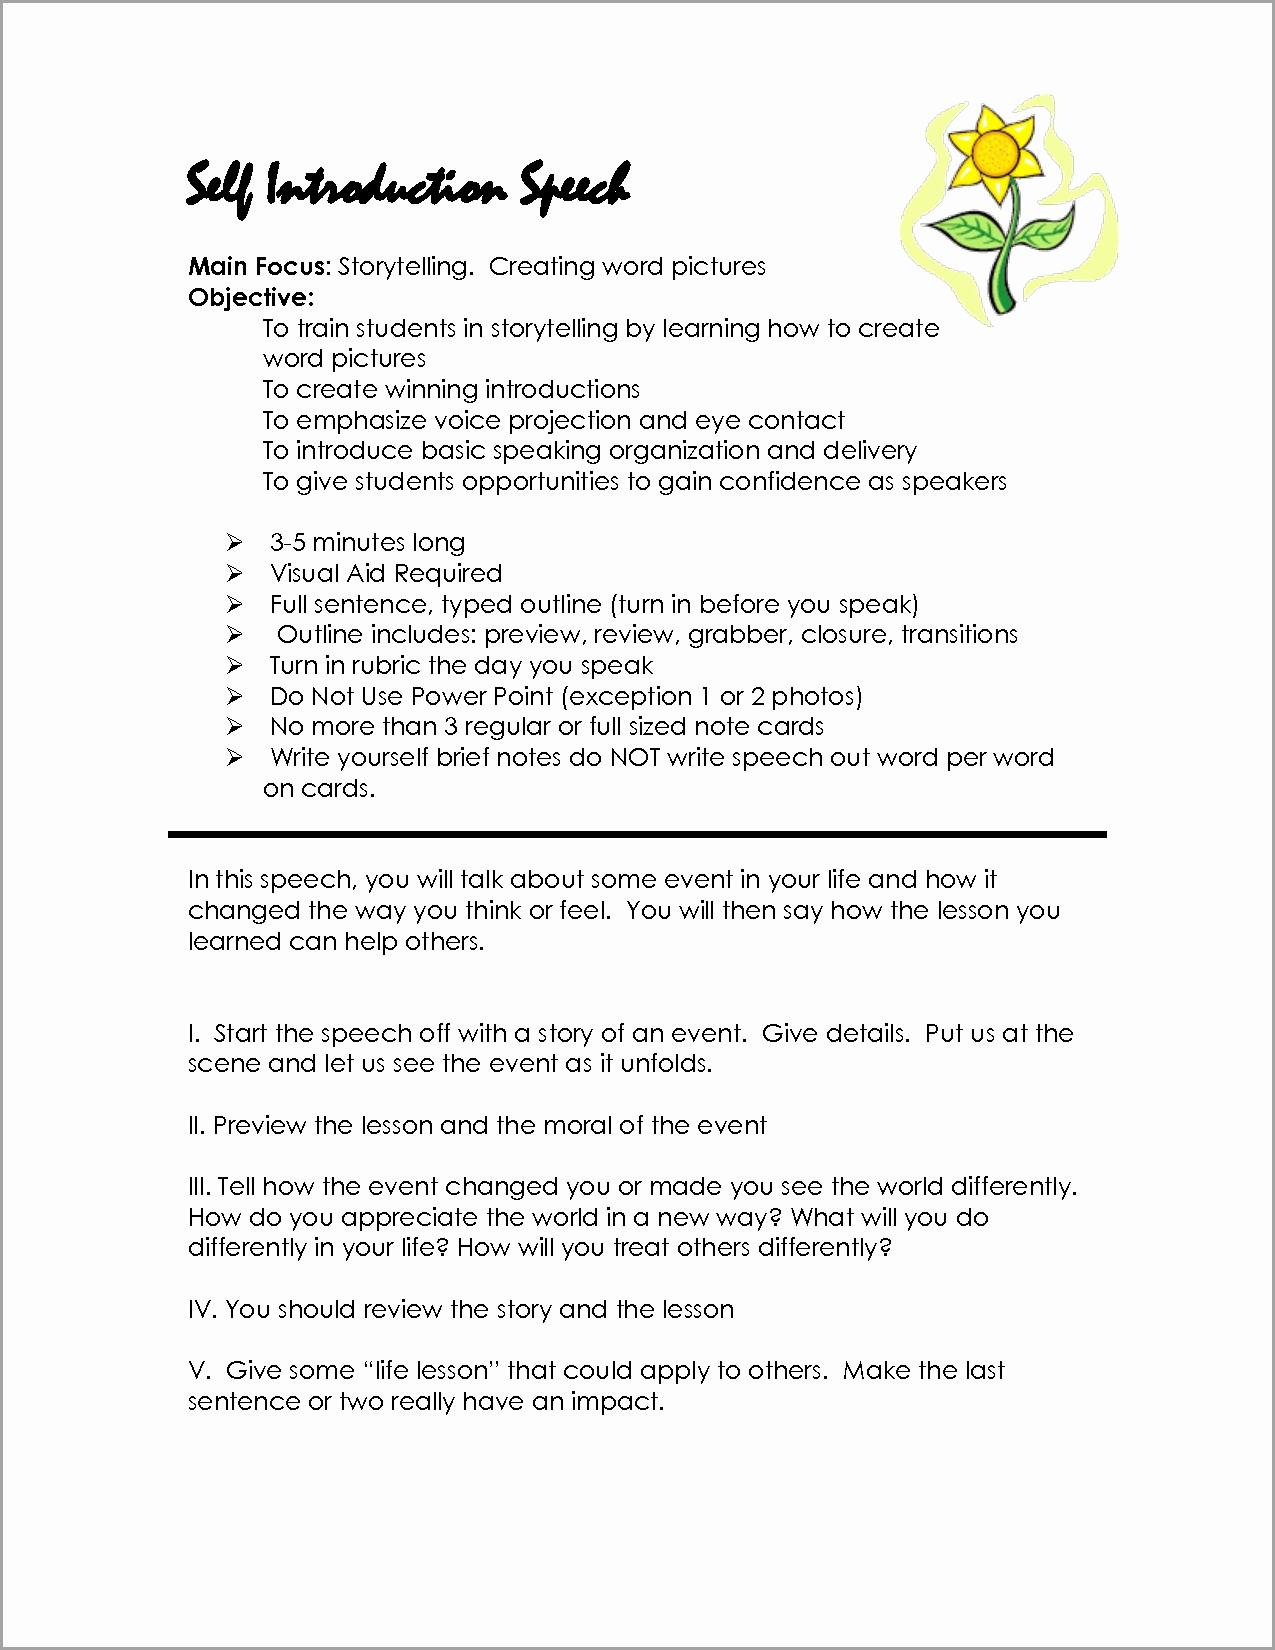 Student Self Introduction Sample Essay